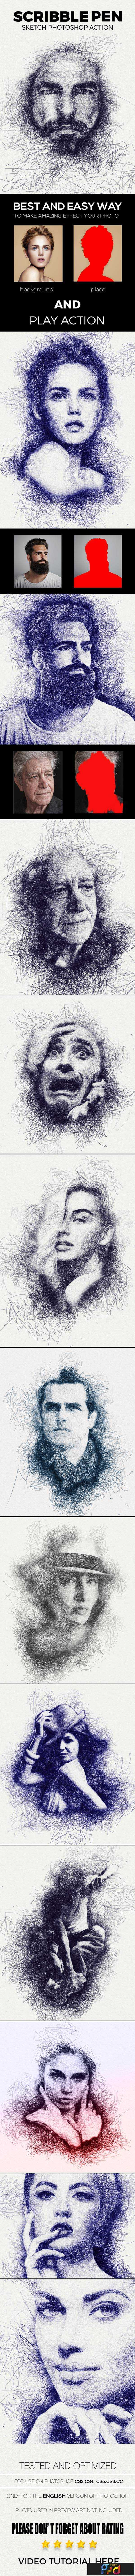 1806111 scribble pen sketch photoshop action 21886396 1